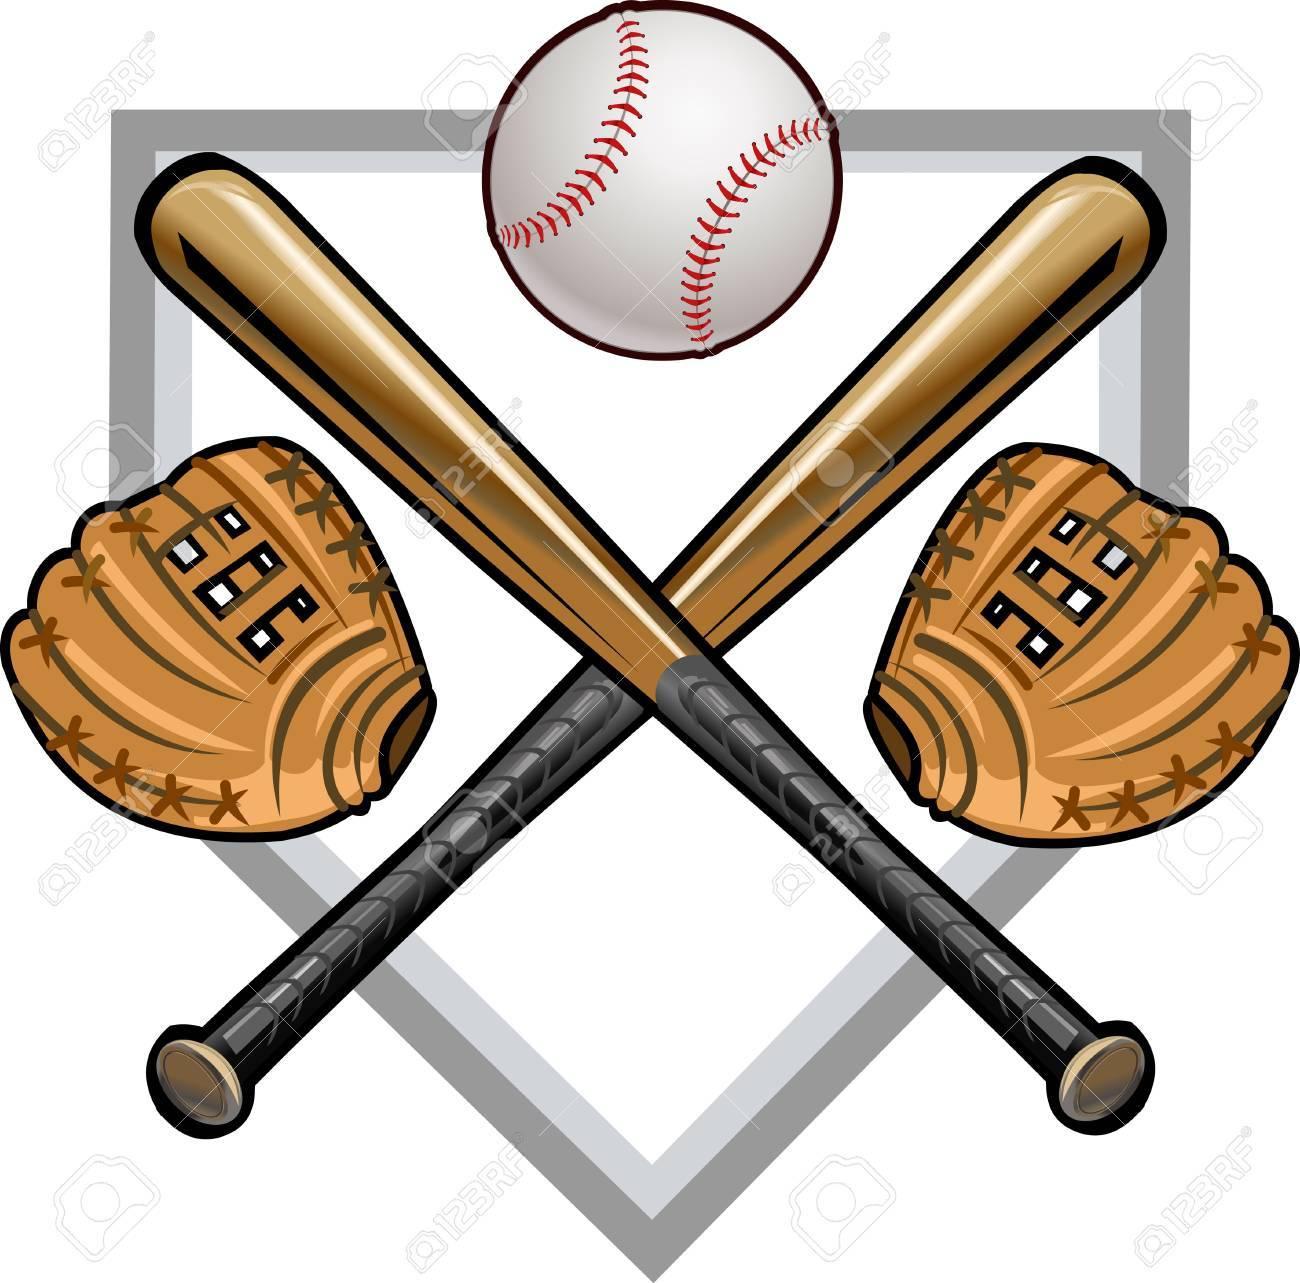 baseball label mitt ball bat royalty free cliparts vectors and rh 123rf com Baseball Bat Vector Silhouette Baseball Bat Clip Art